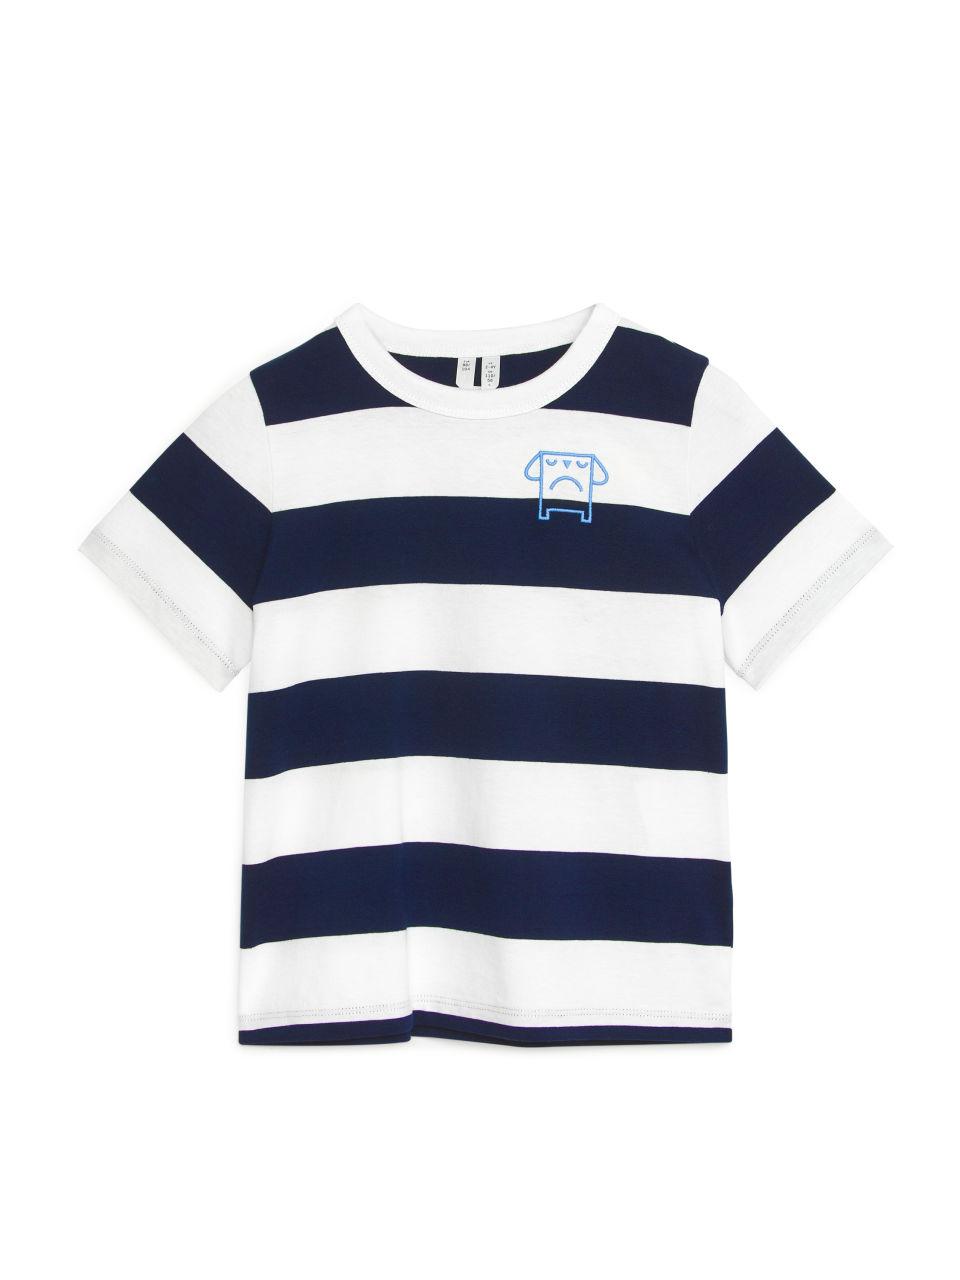 Block-Striped T-Shirt - Blue